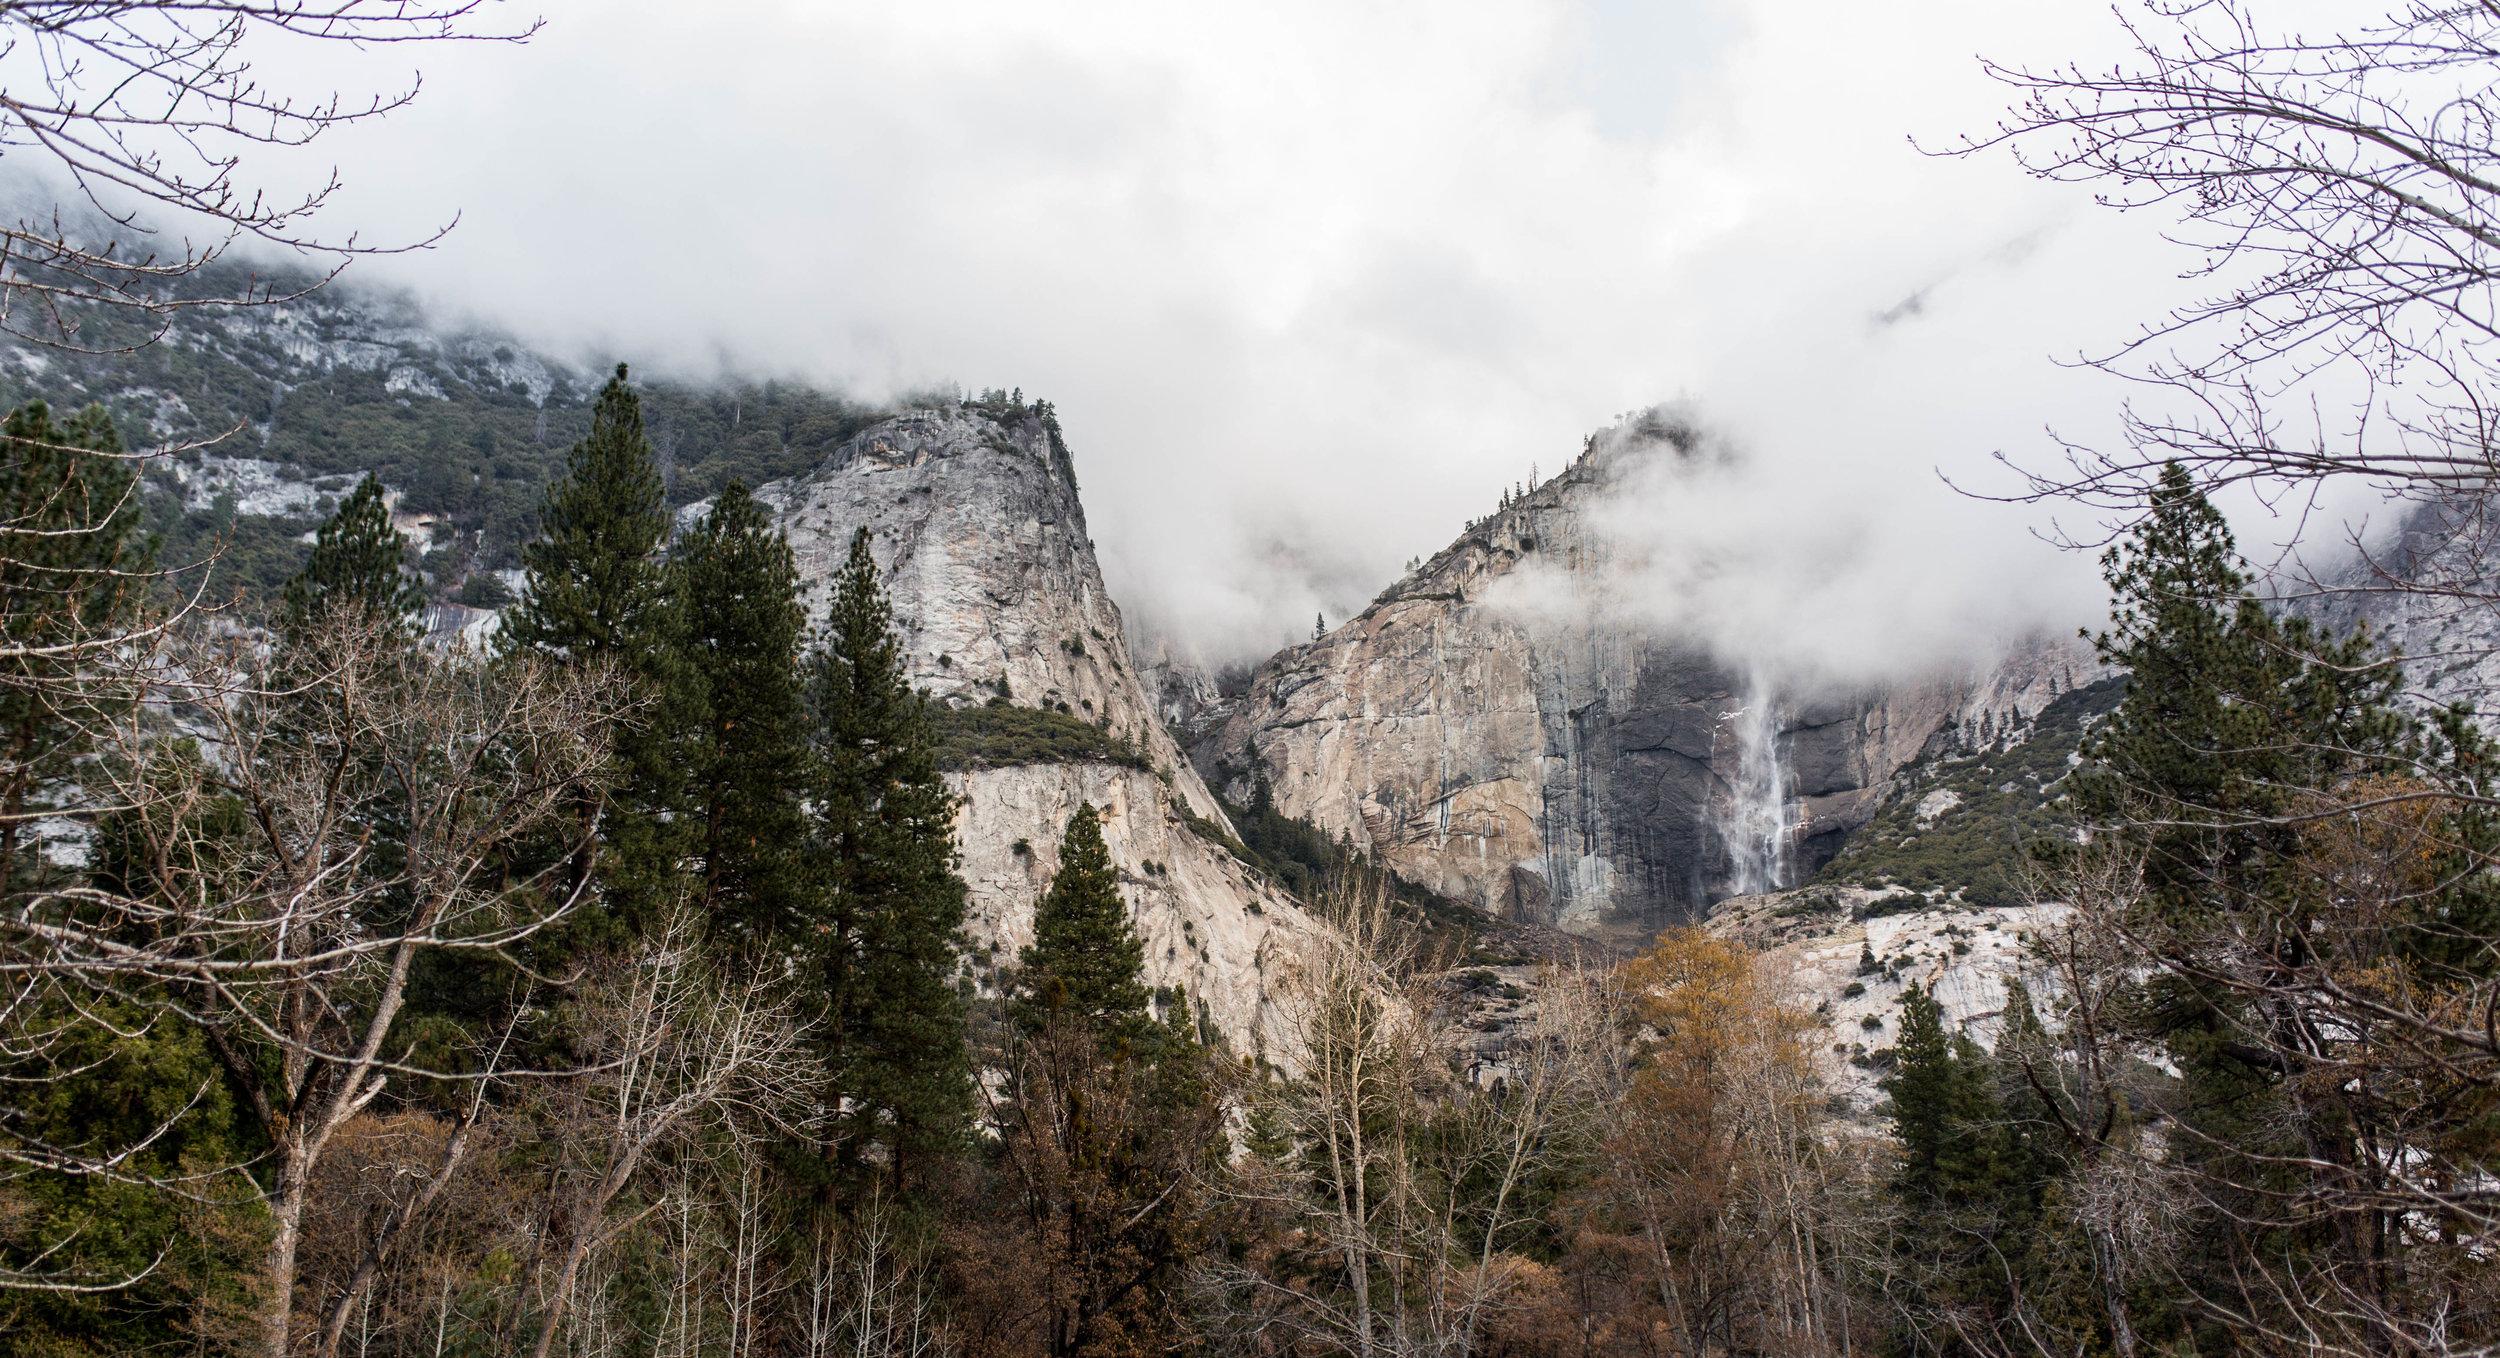 Nicole-Daacke-Photography-Vibrant-Landscape-National-Geographic-Yosemite-National-Park-California-Foggy-Photography-38.jpg